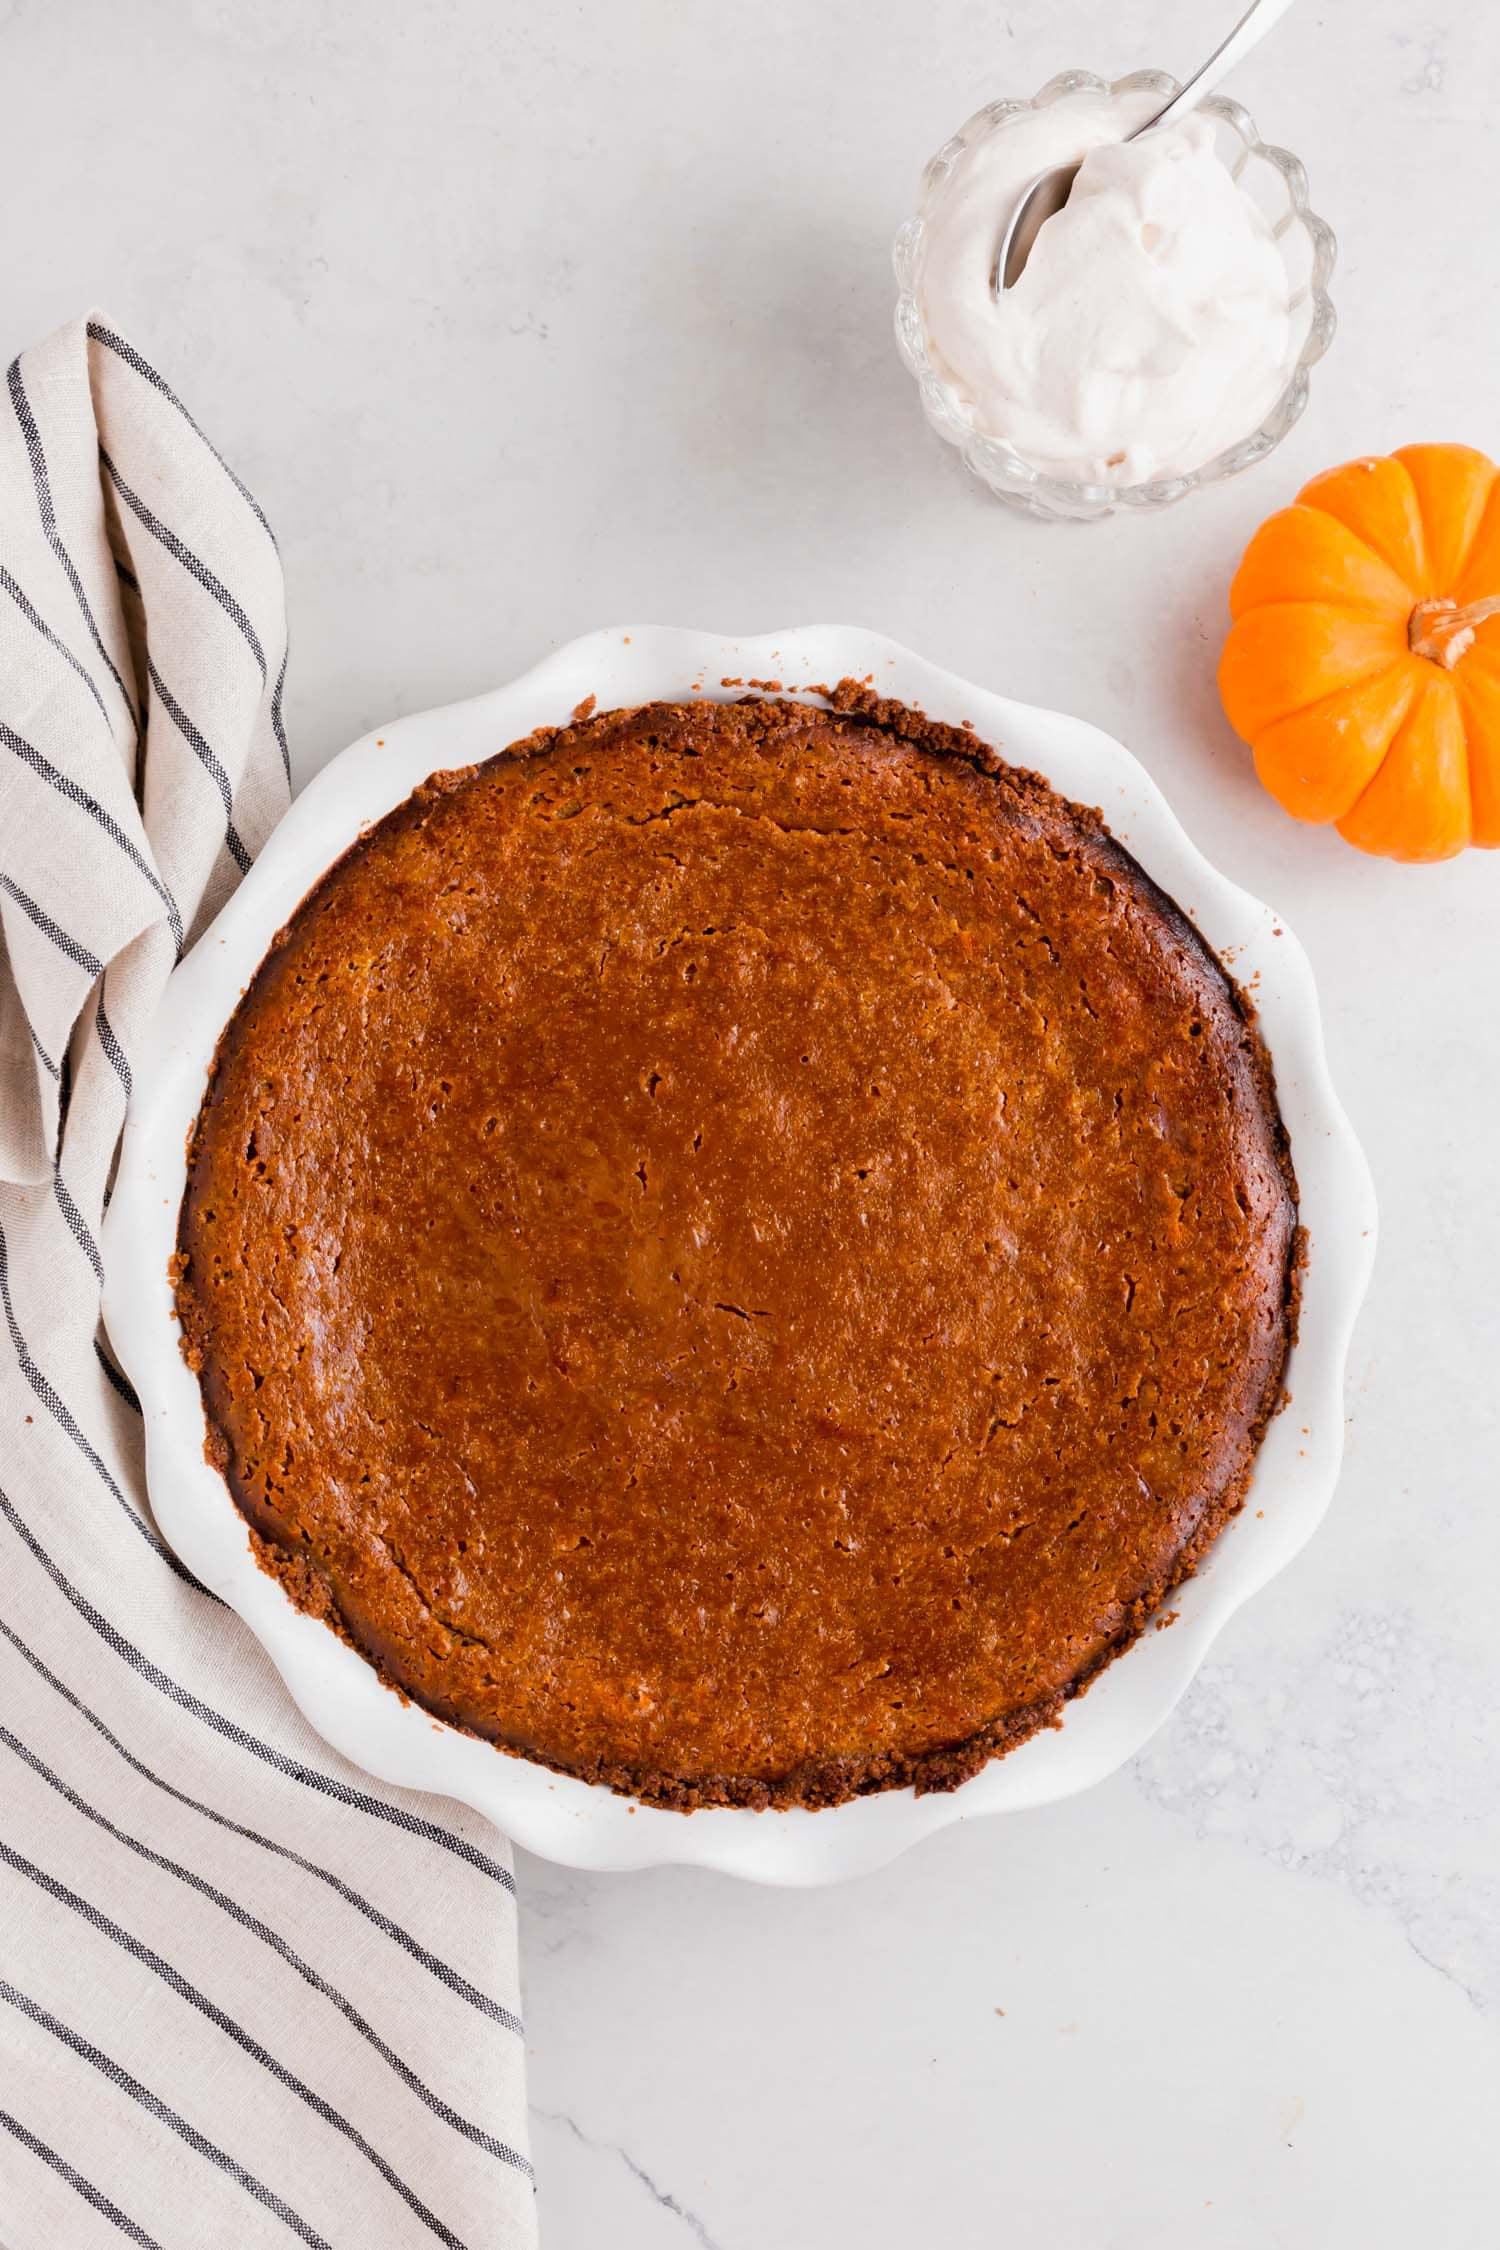 A gluten-free pumpkin pie with graham cracker crust after baking.